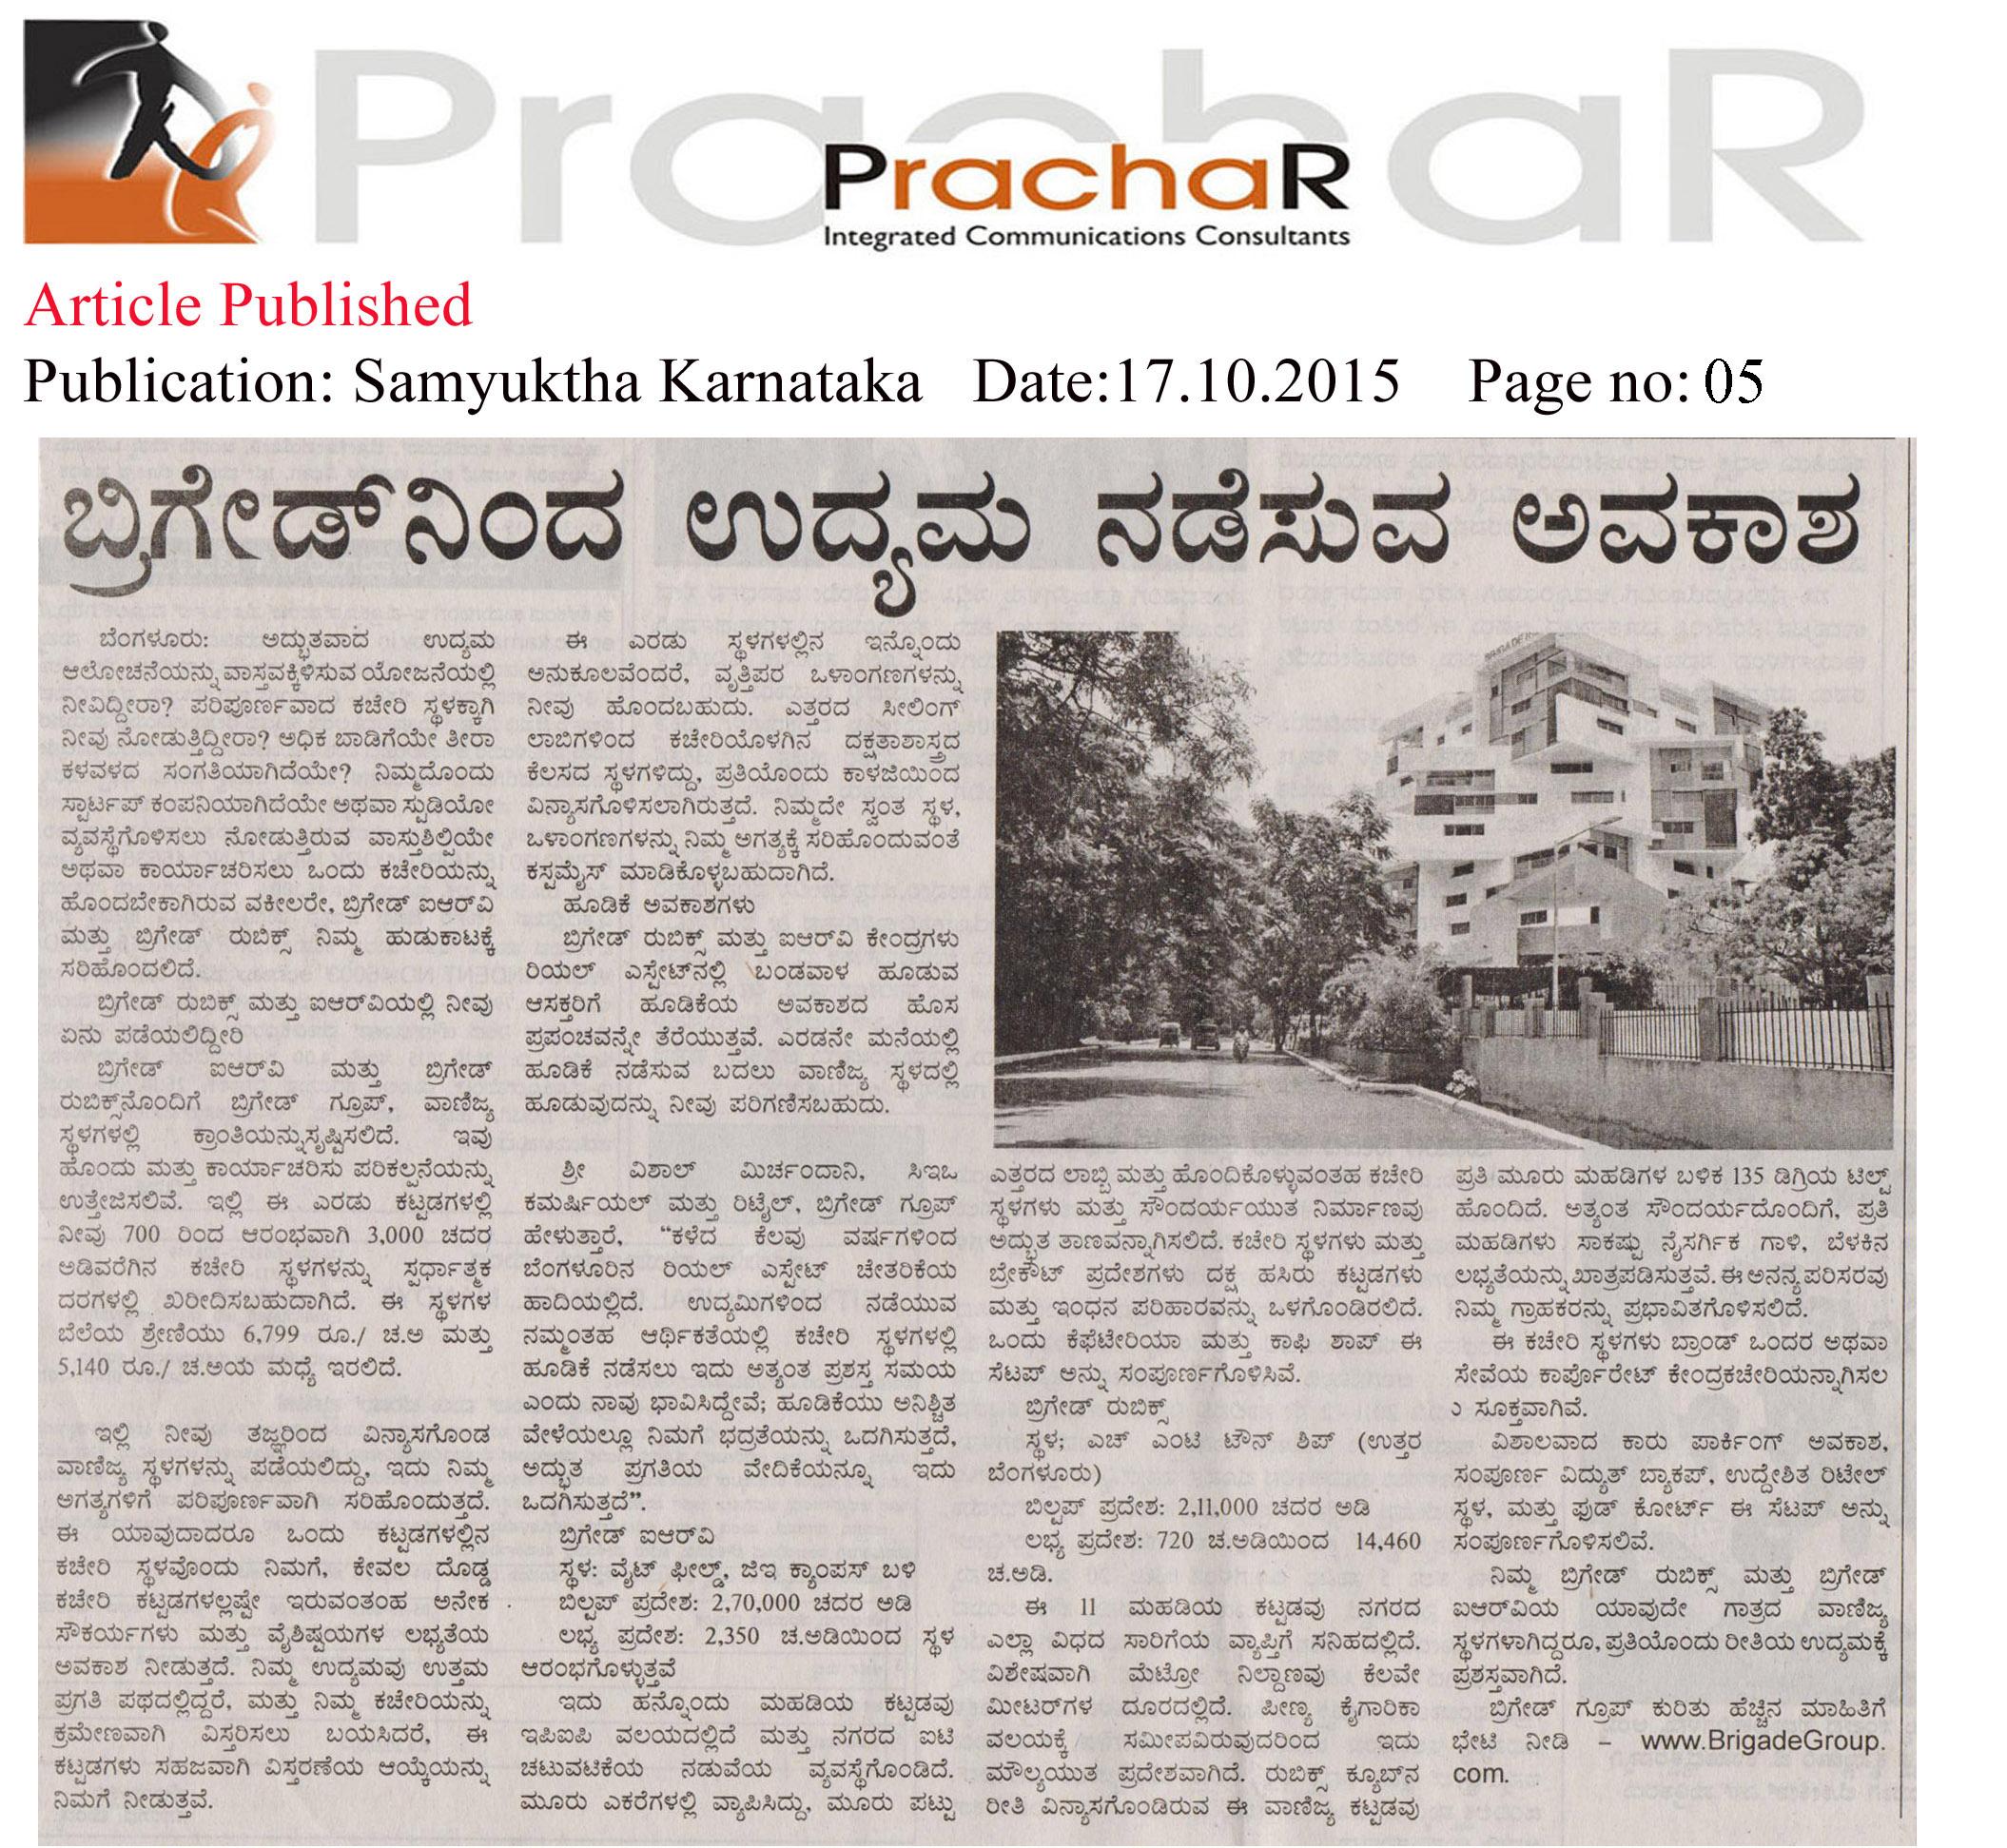 Small office space for Brigade - Samyuktha Karnataka